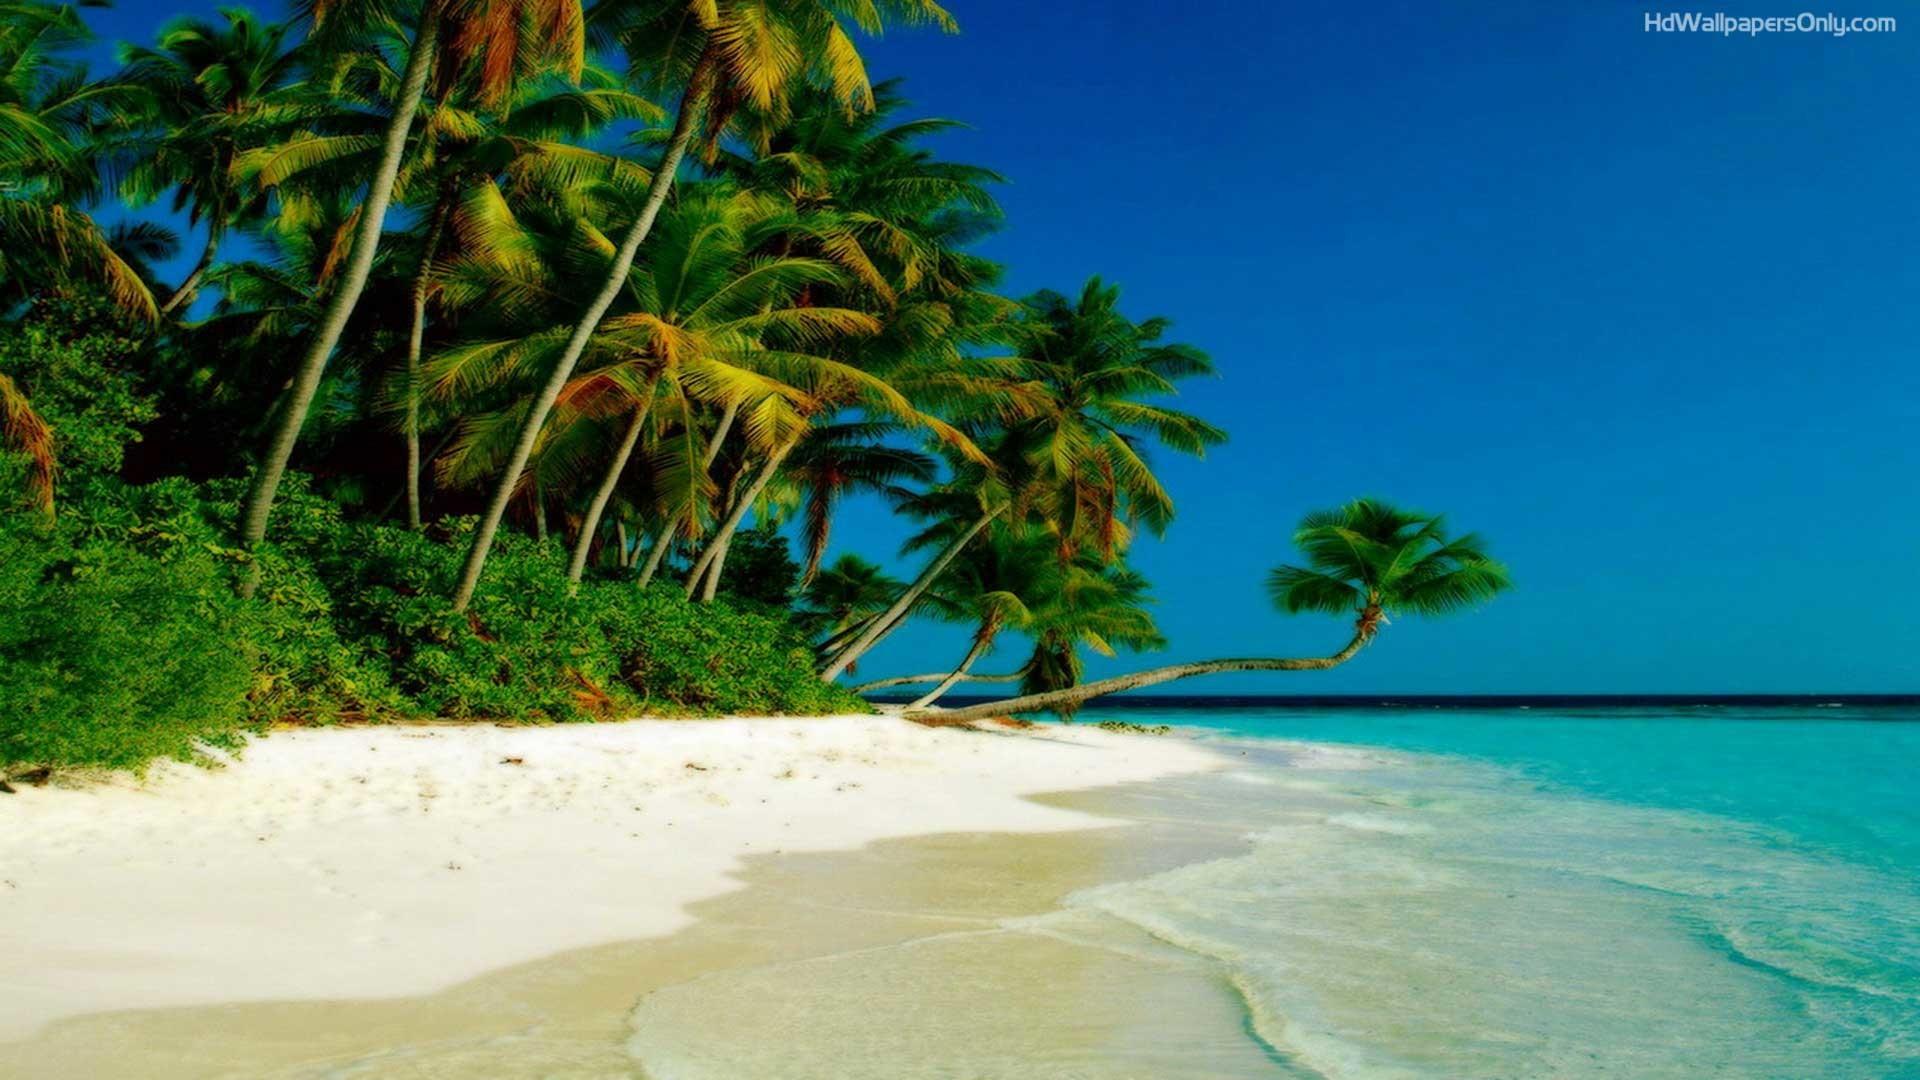 Beach Hd Wallpaper 1080p – High Quality Images .